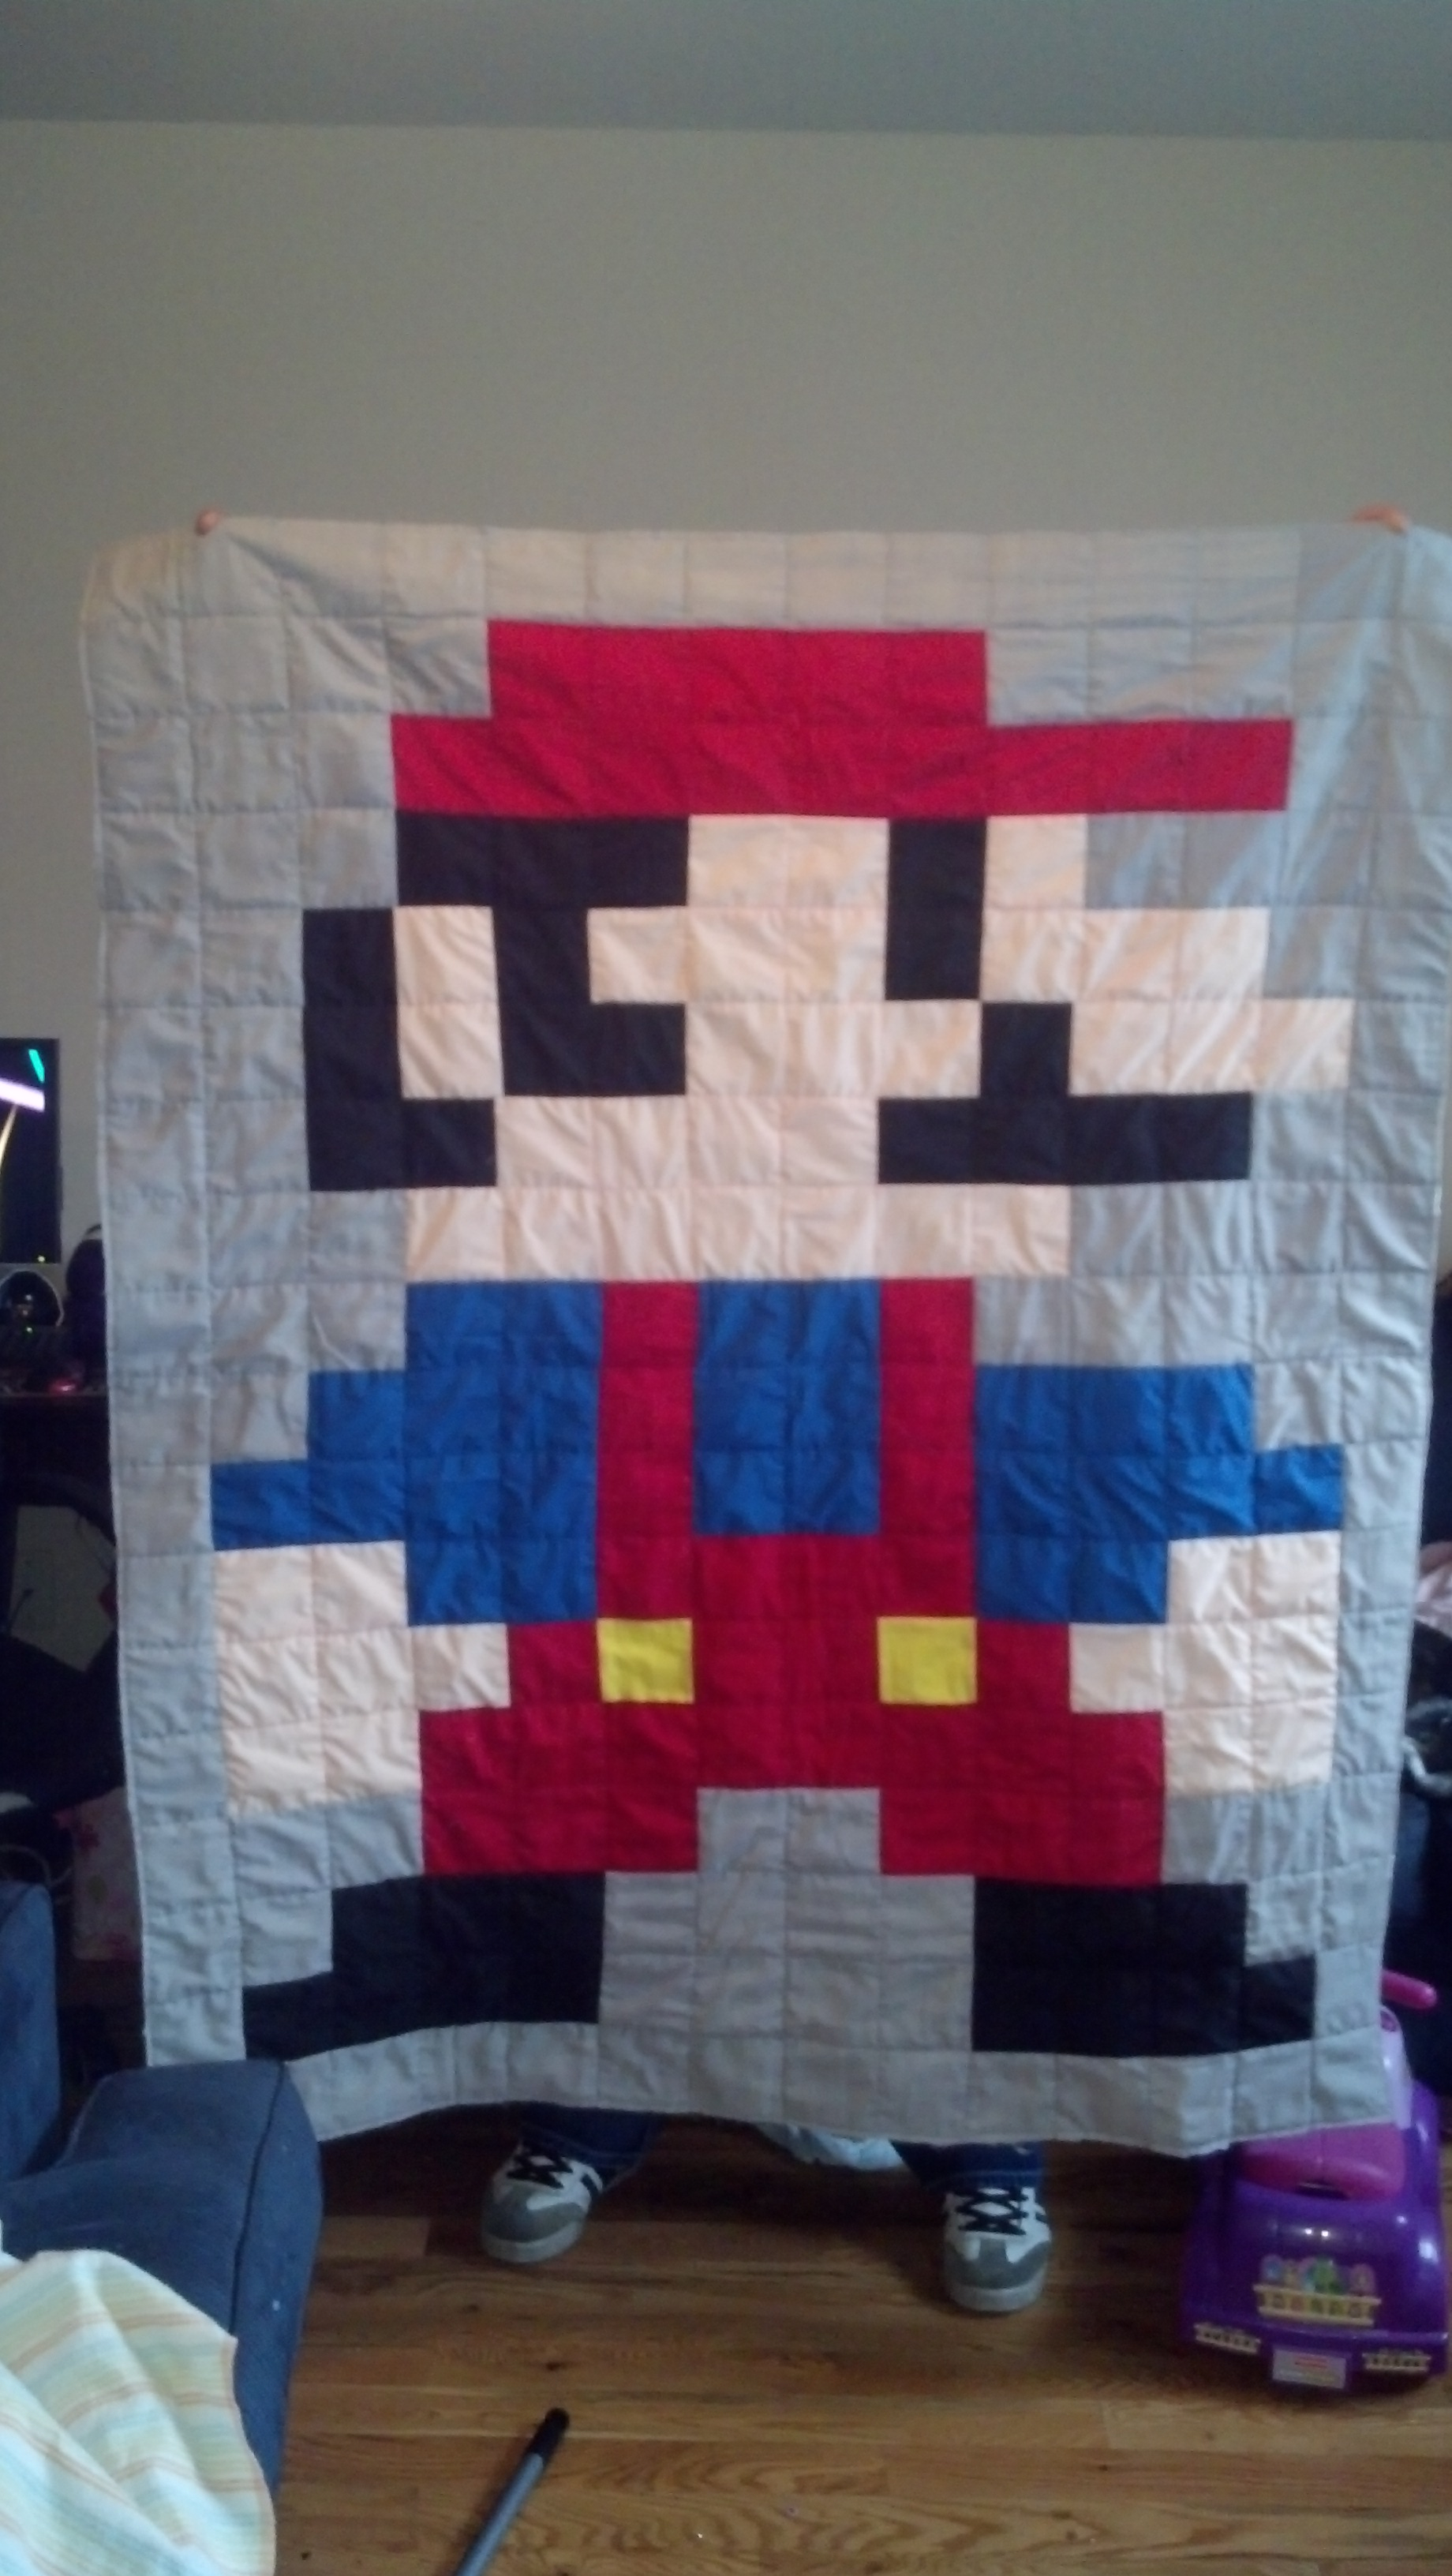 The Great 8-Bit Mario Quilt Adventure | tolmema : 8 bit quilt - Adamdwight.com